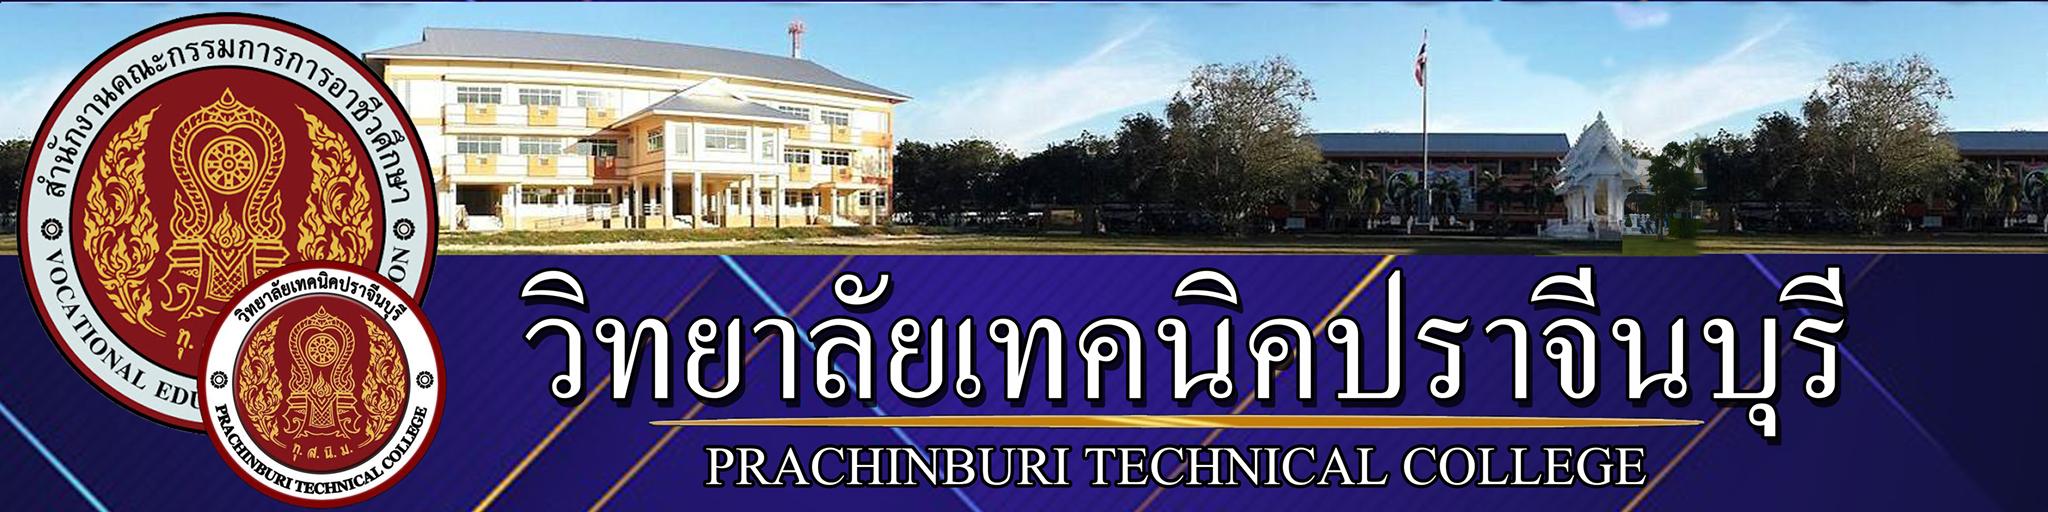 <p Prachinburi Technical College hidden><p hidden>